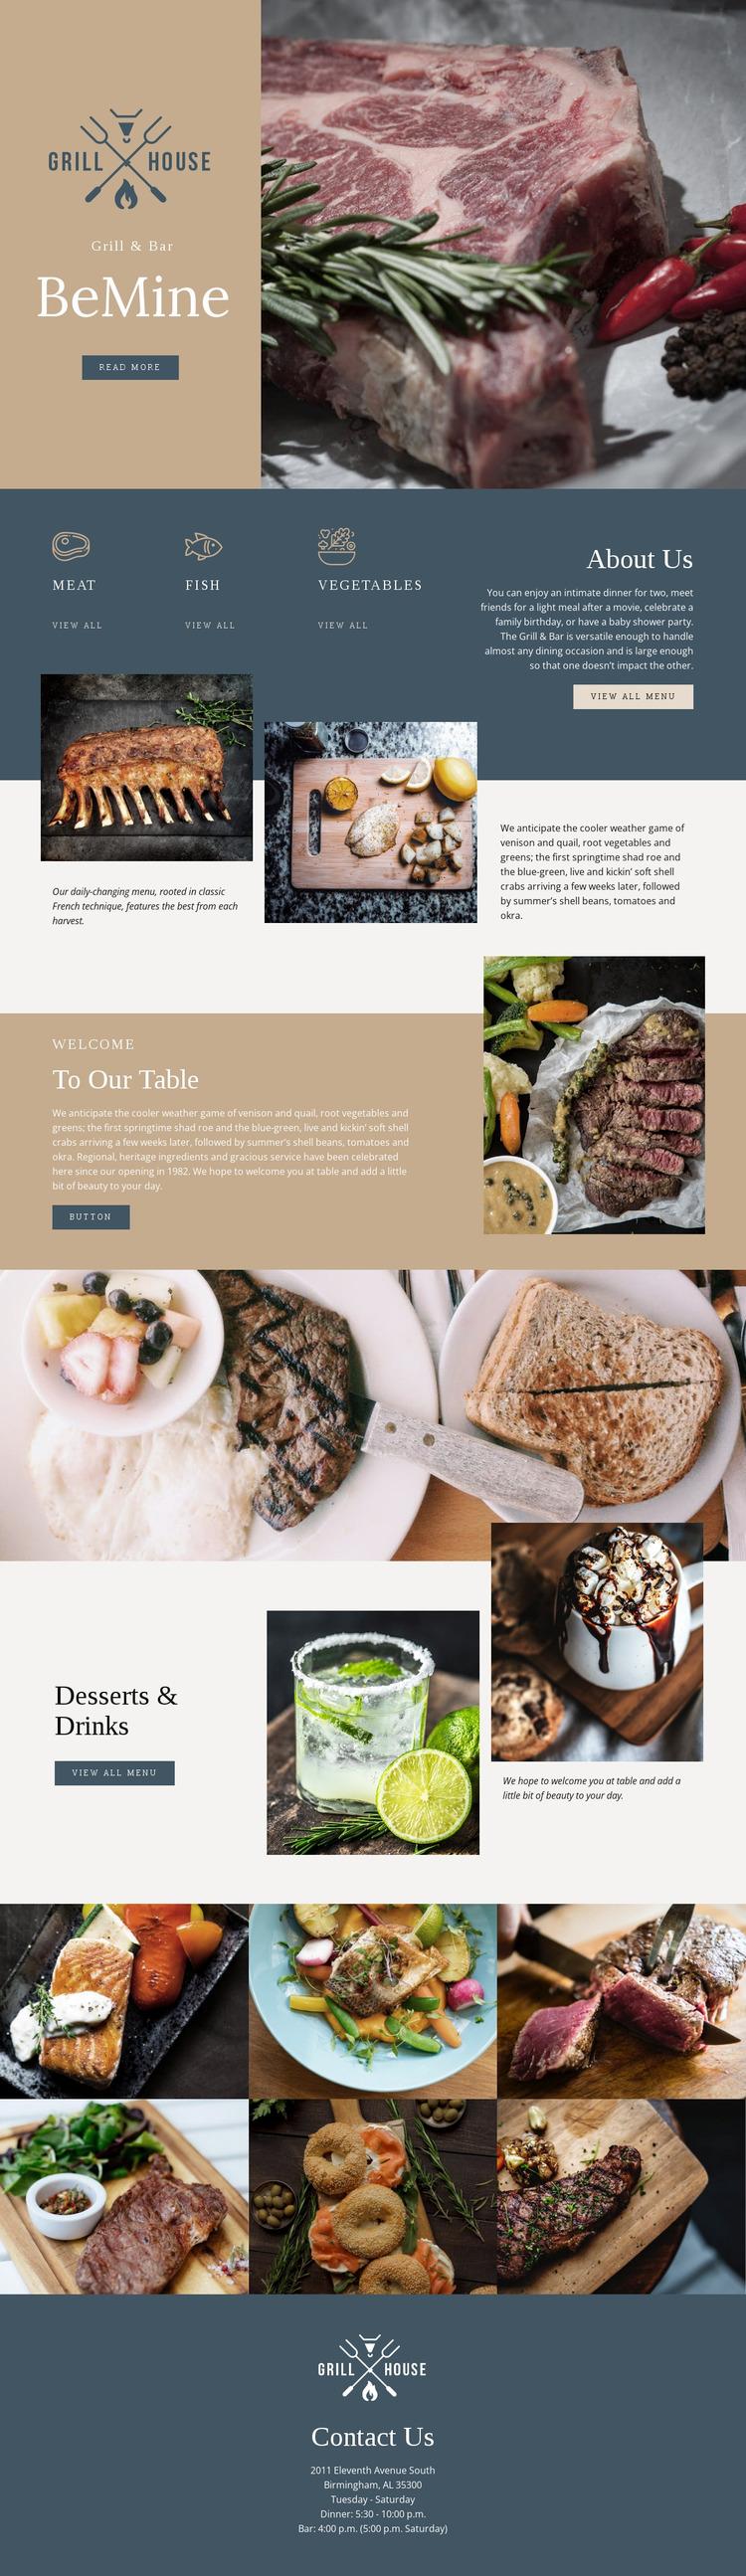 Finest grill house restaurant WordPress Website Builder